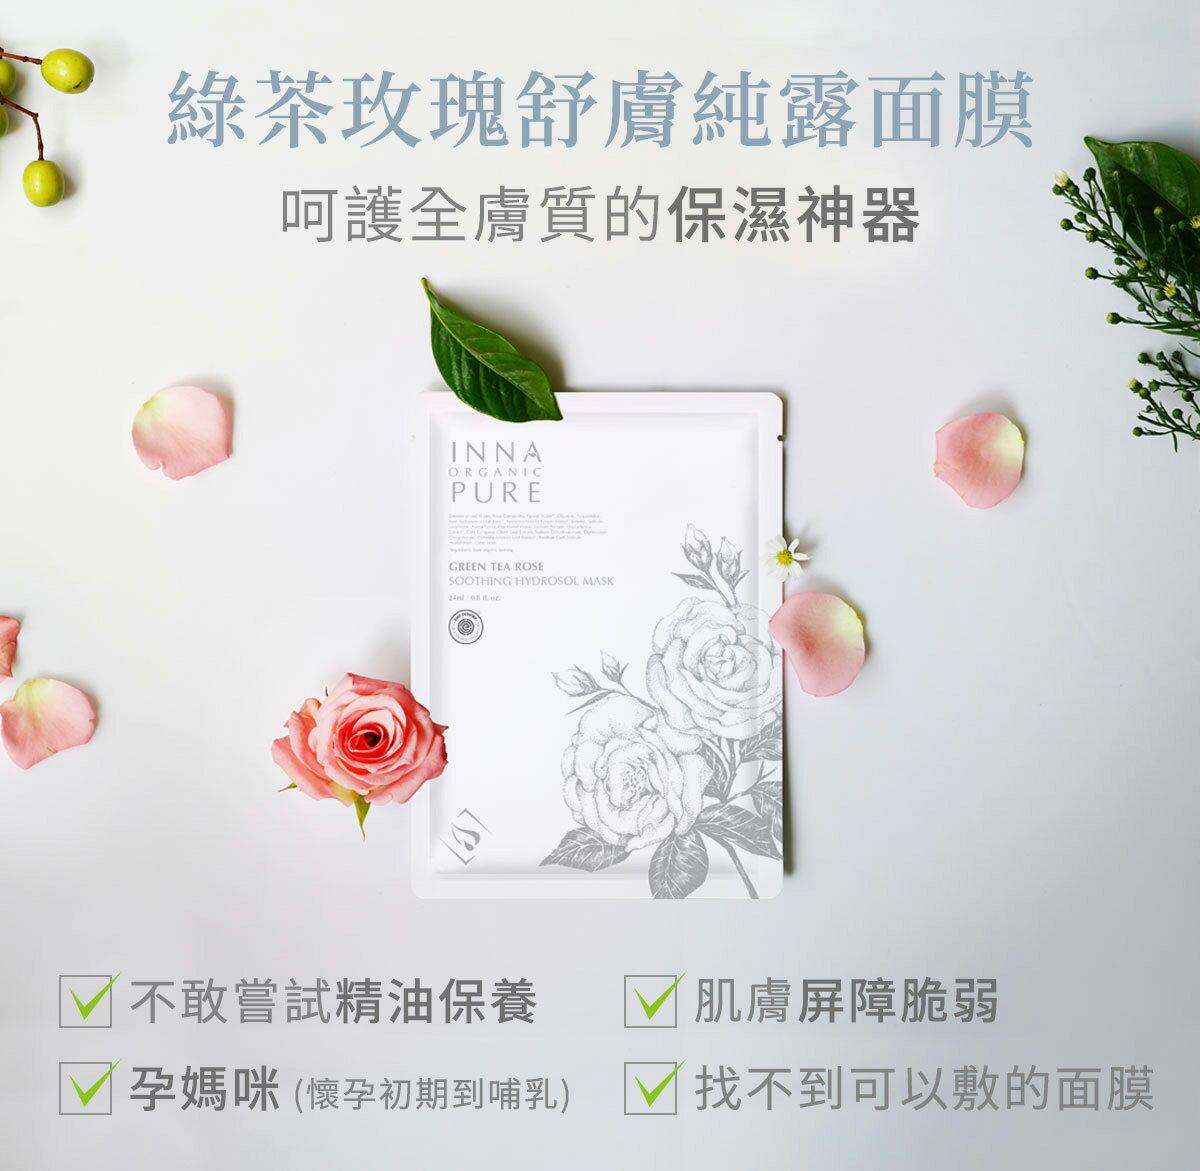 MIT👍滿額贈♥️【Inna Organic 童顏有機】綠茶玫瑰舒膚純露面膜 (1片) 1